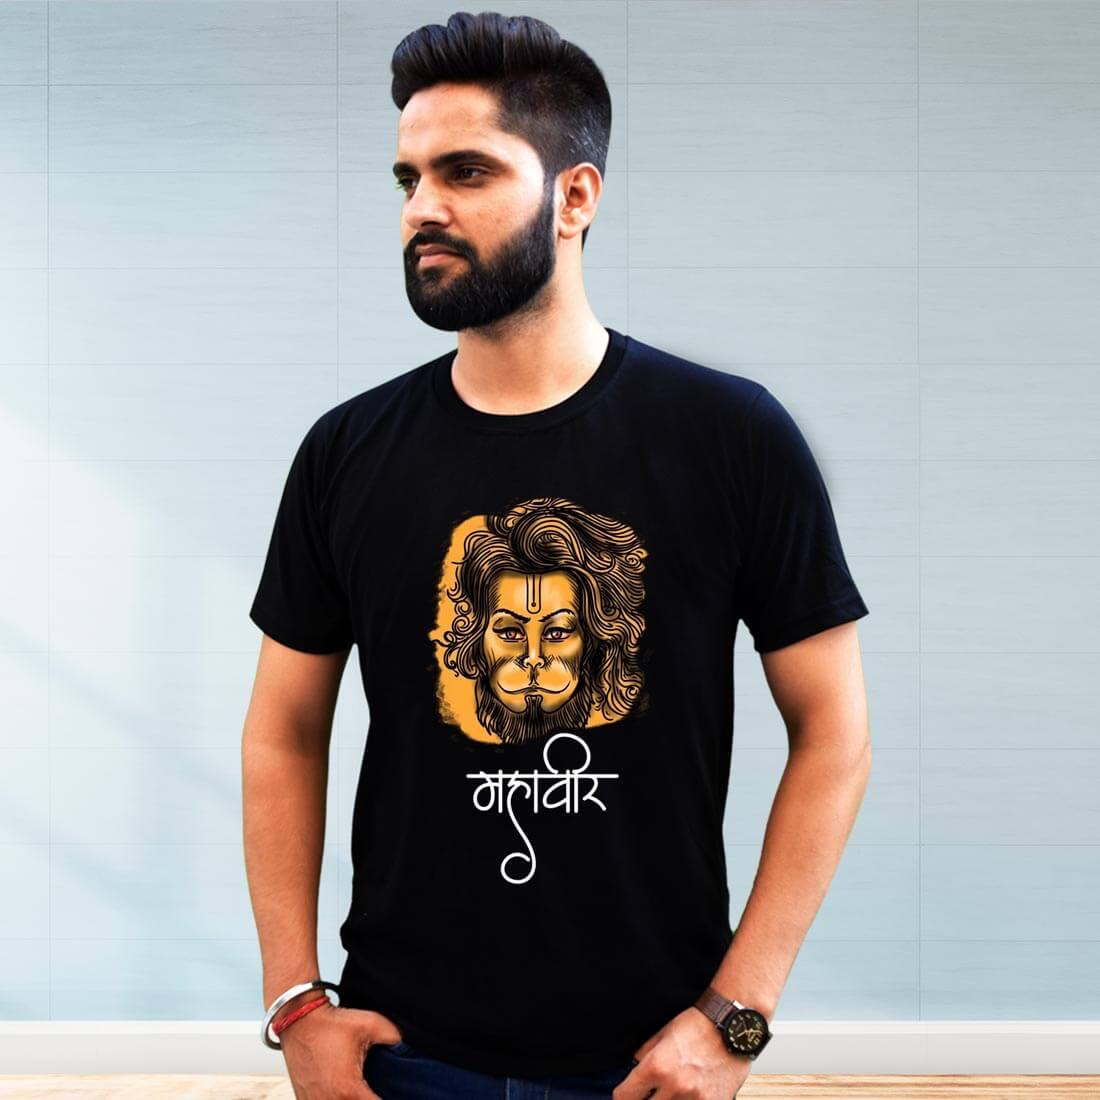 Mahaveer Hanuman T-shirt